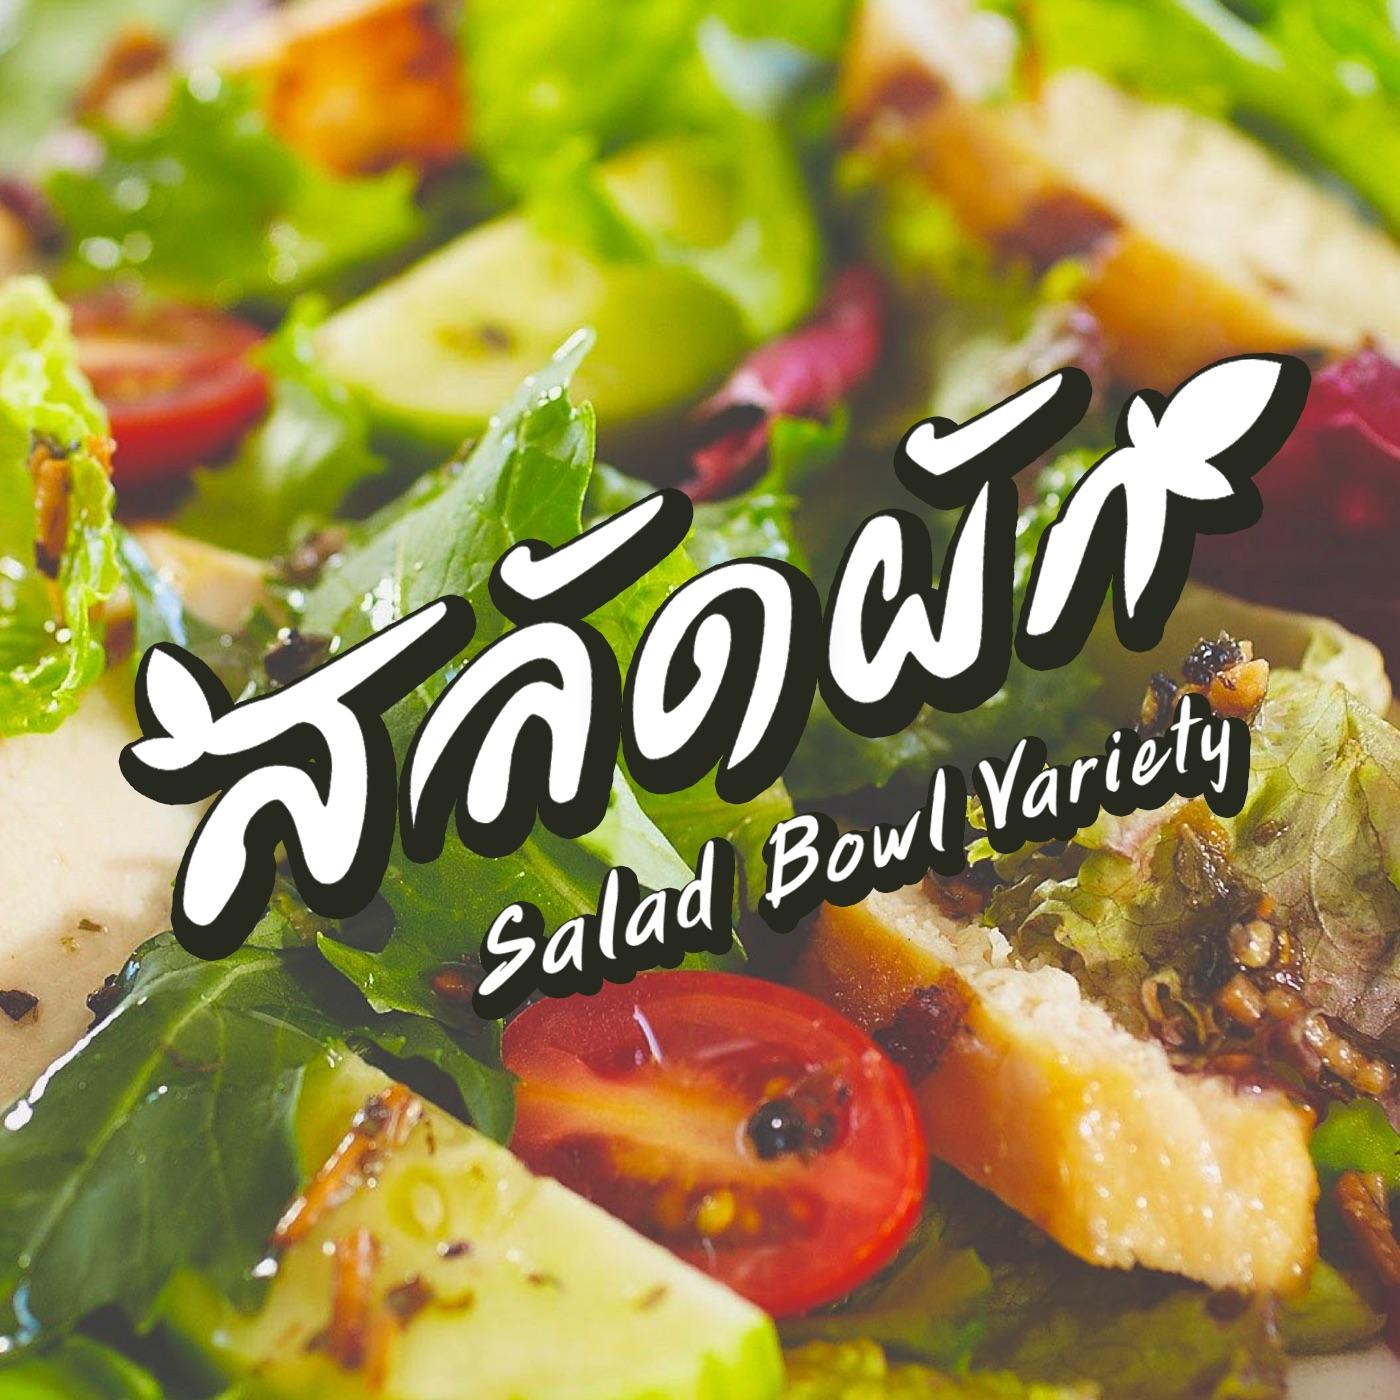 Salad Bowl Variety